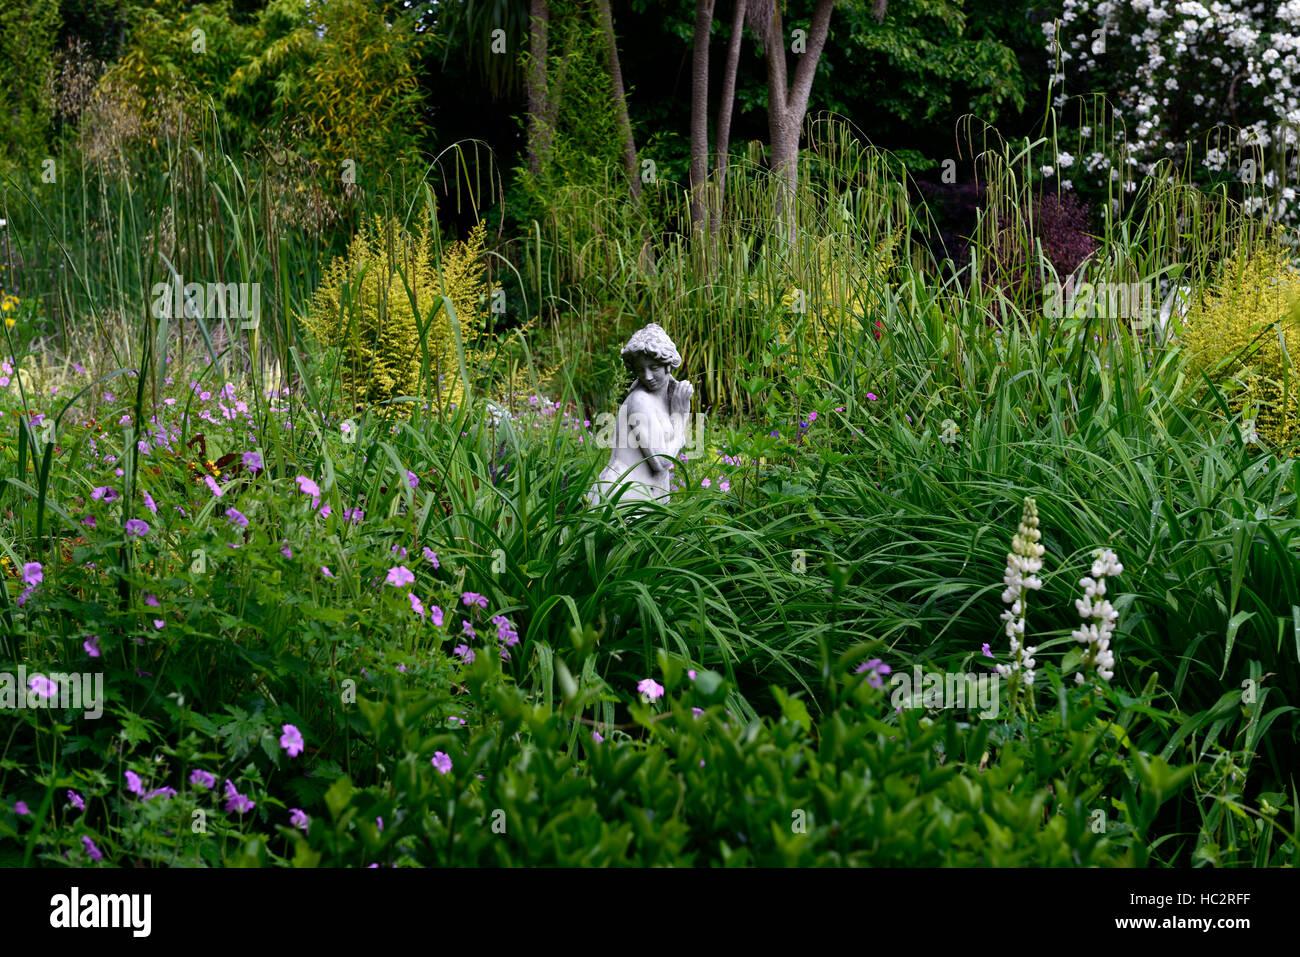 green leaves foliage garden design center centered around statue victorian victorianesque feature gardening RM Floral - Stock Image